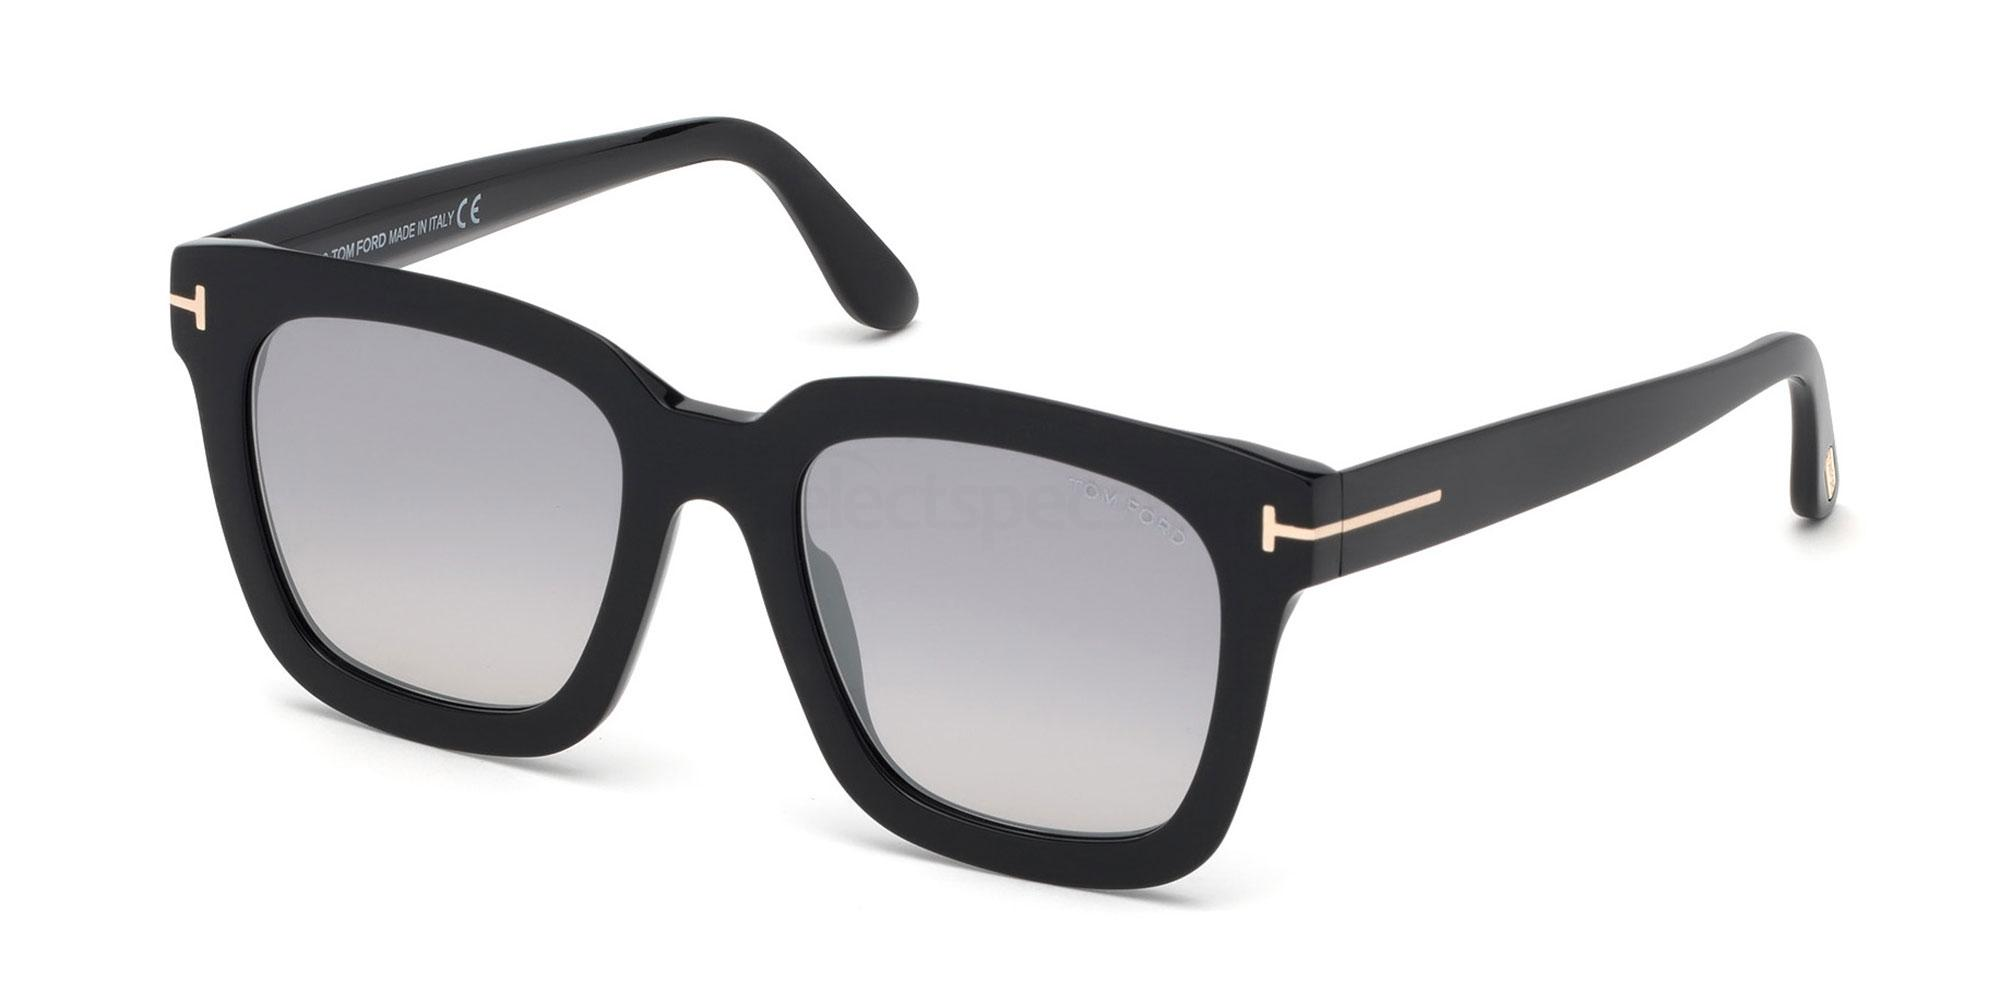 01C FT0690 Sunglasses, Tom Ford